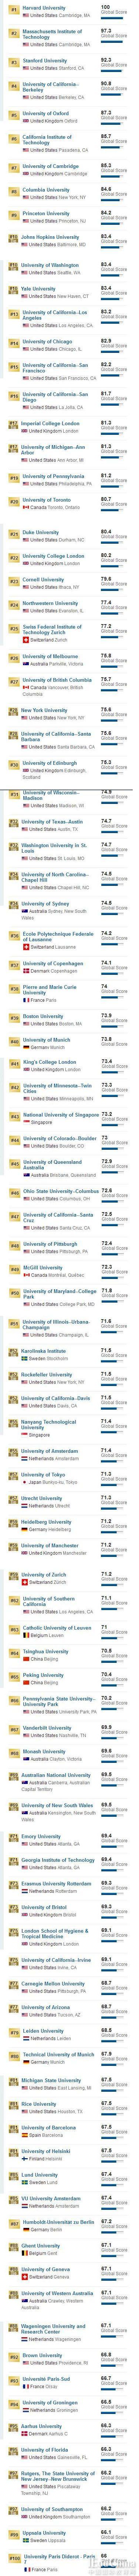 U.S.News2018世界大学排名TOP100